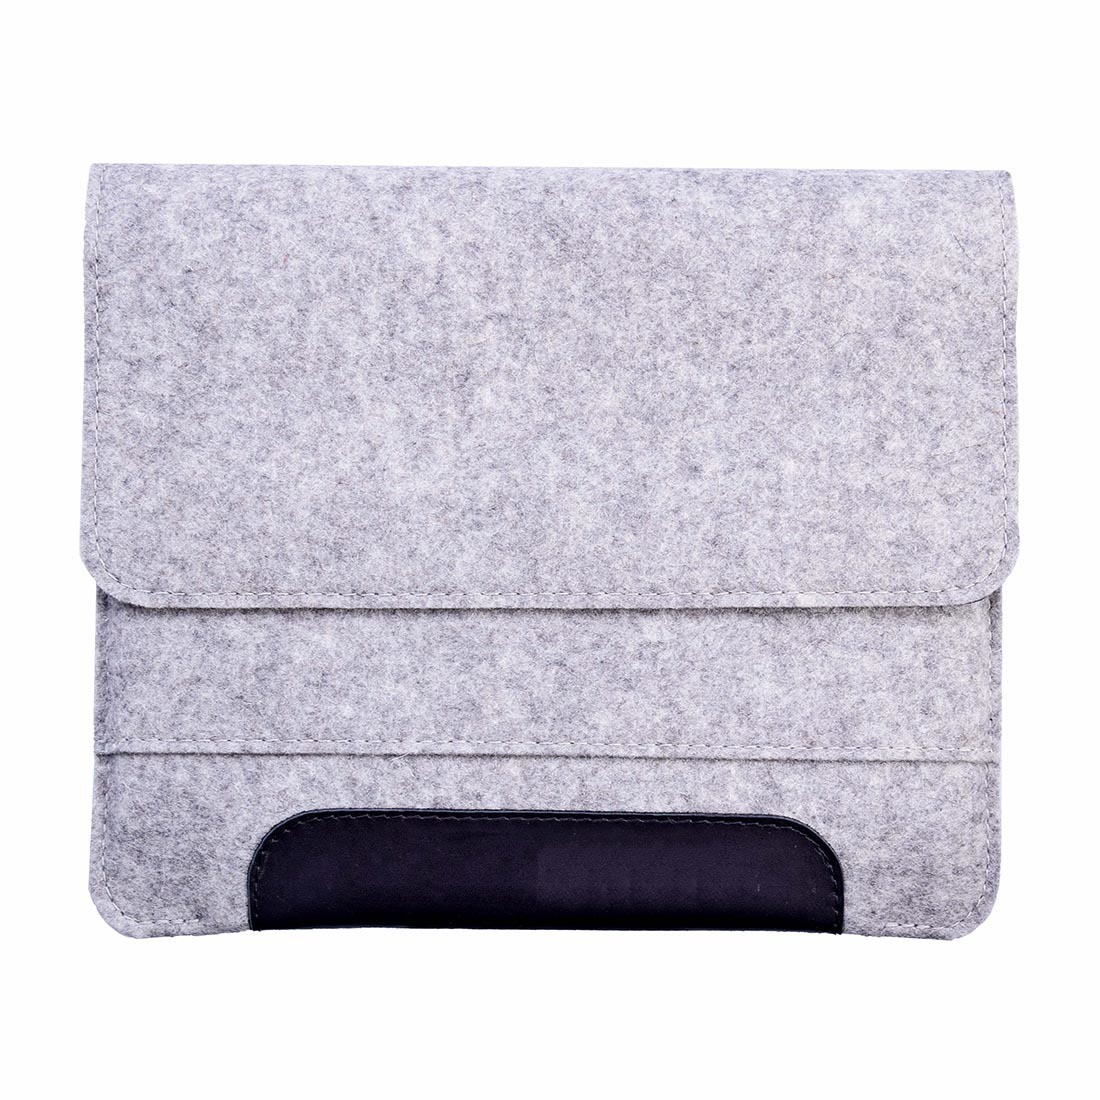 Tablet-Tasche Malou